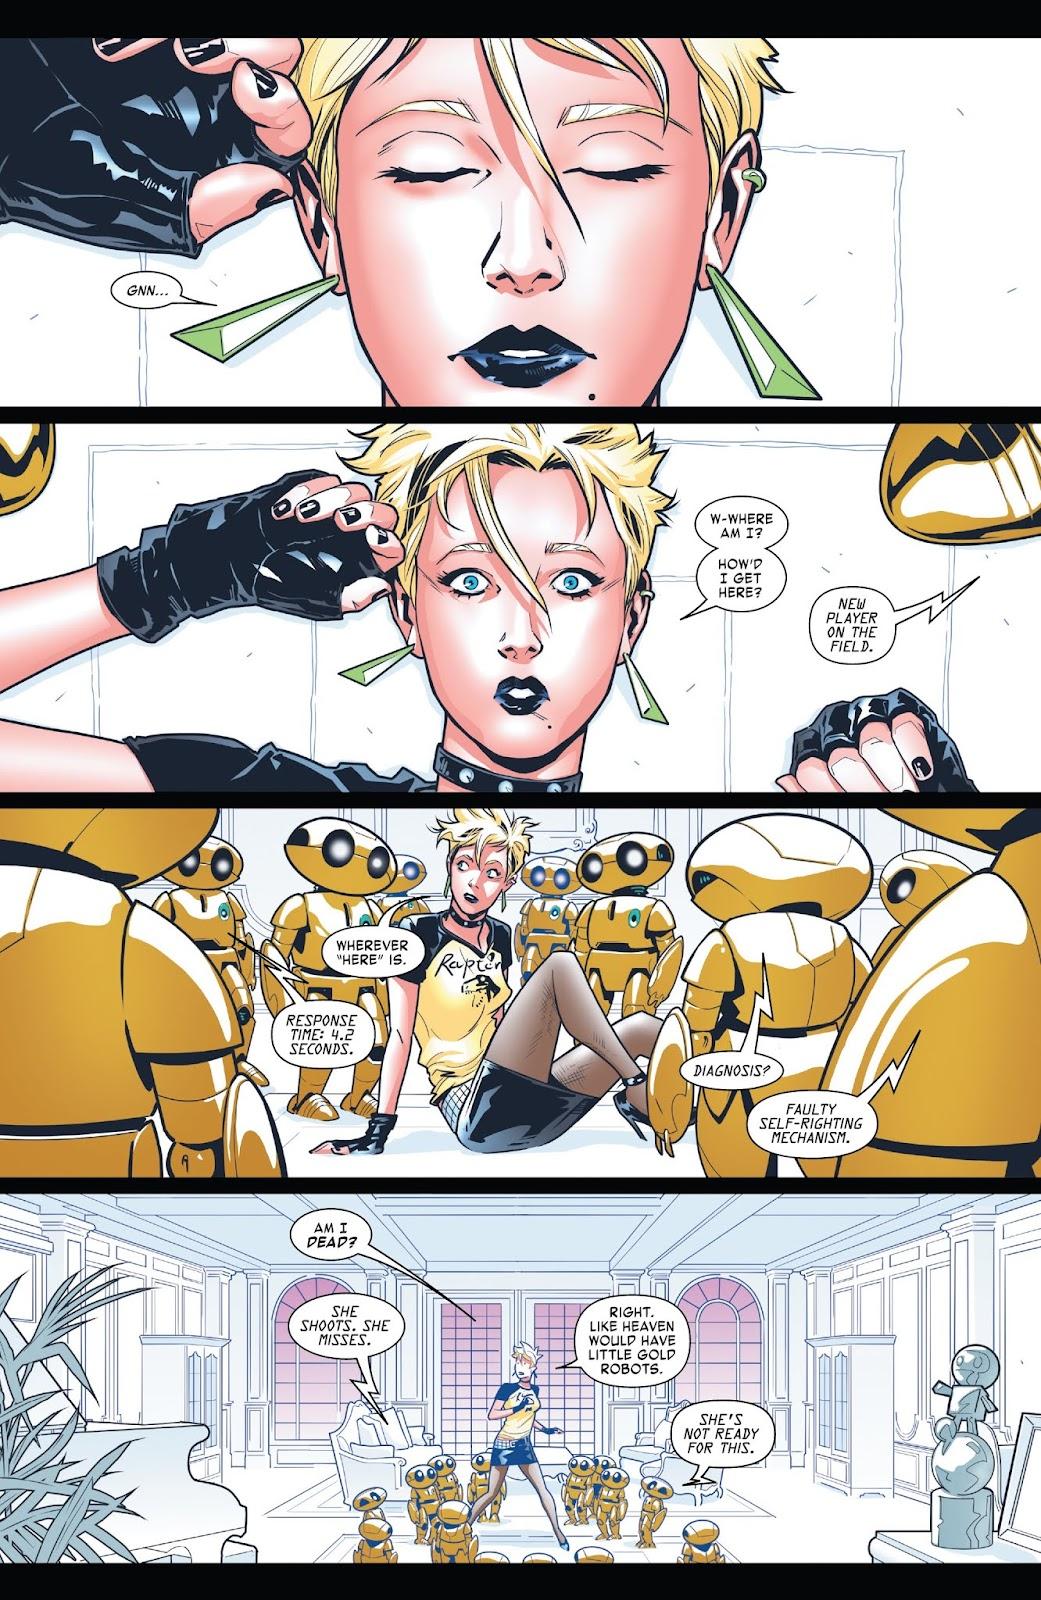 Read online Tony Stark: Iron Man comic -  Issue #7 - 7